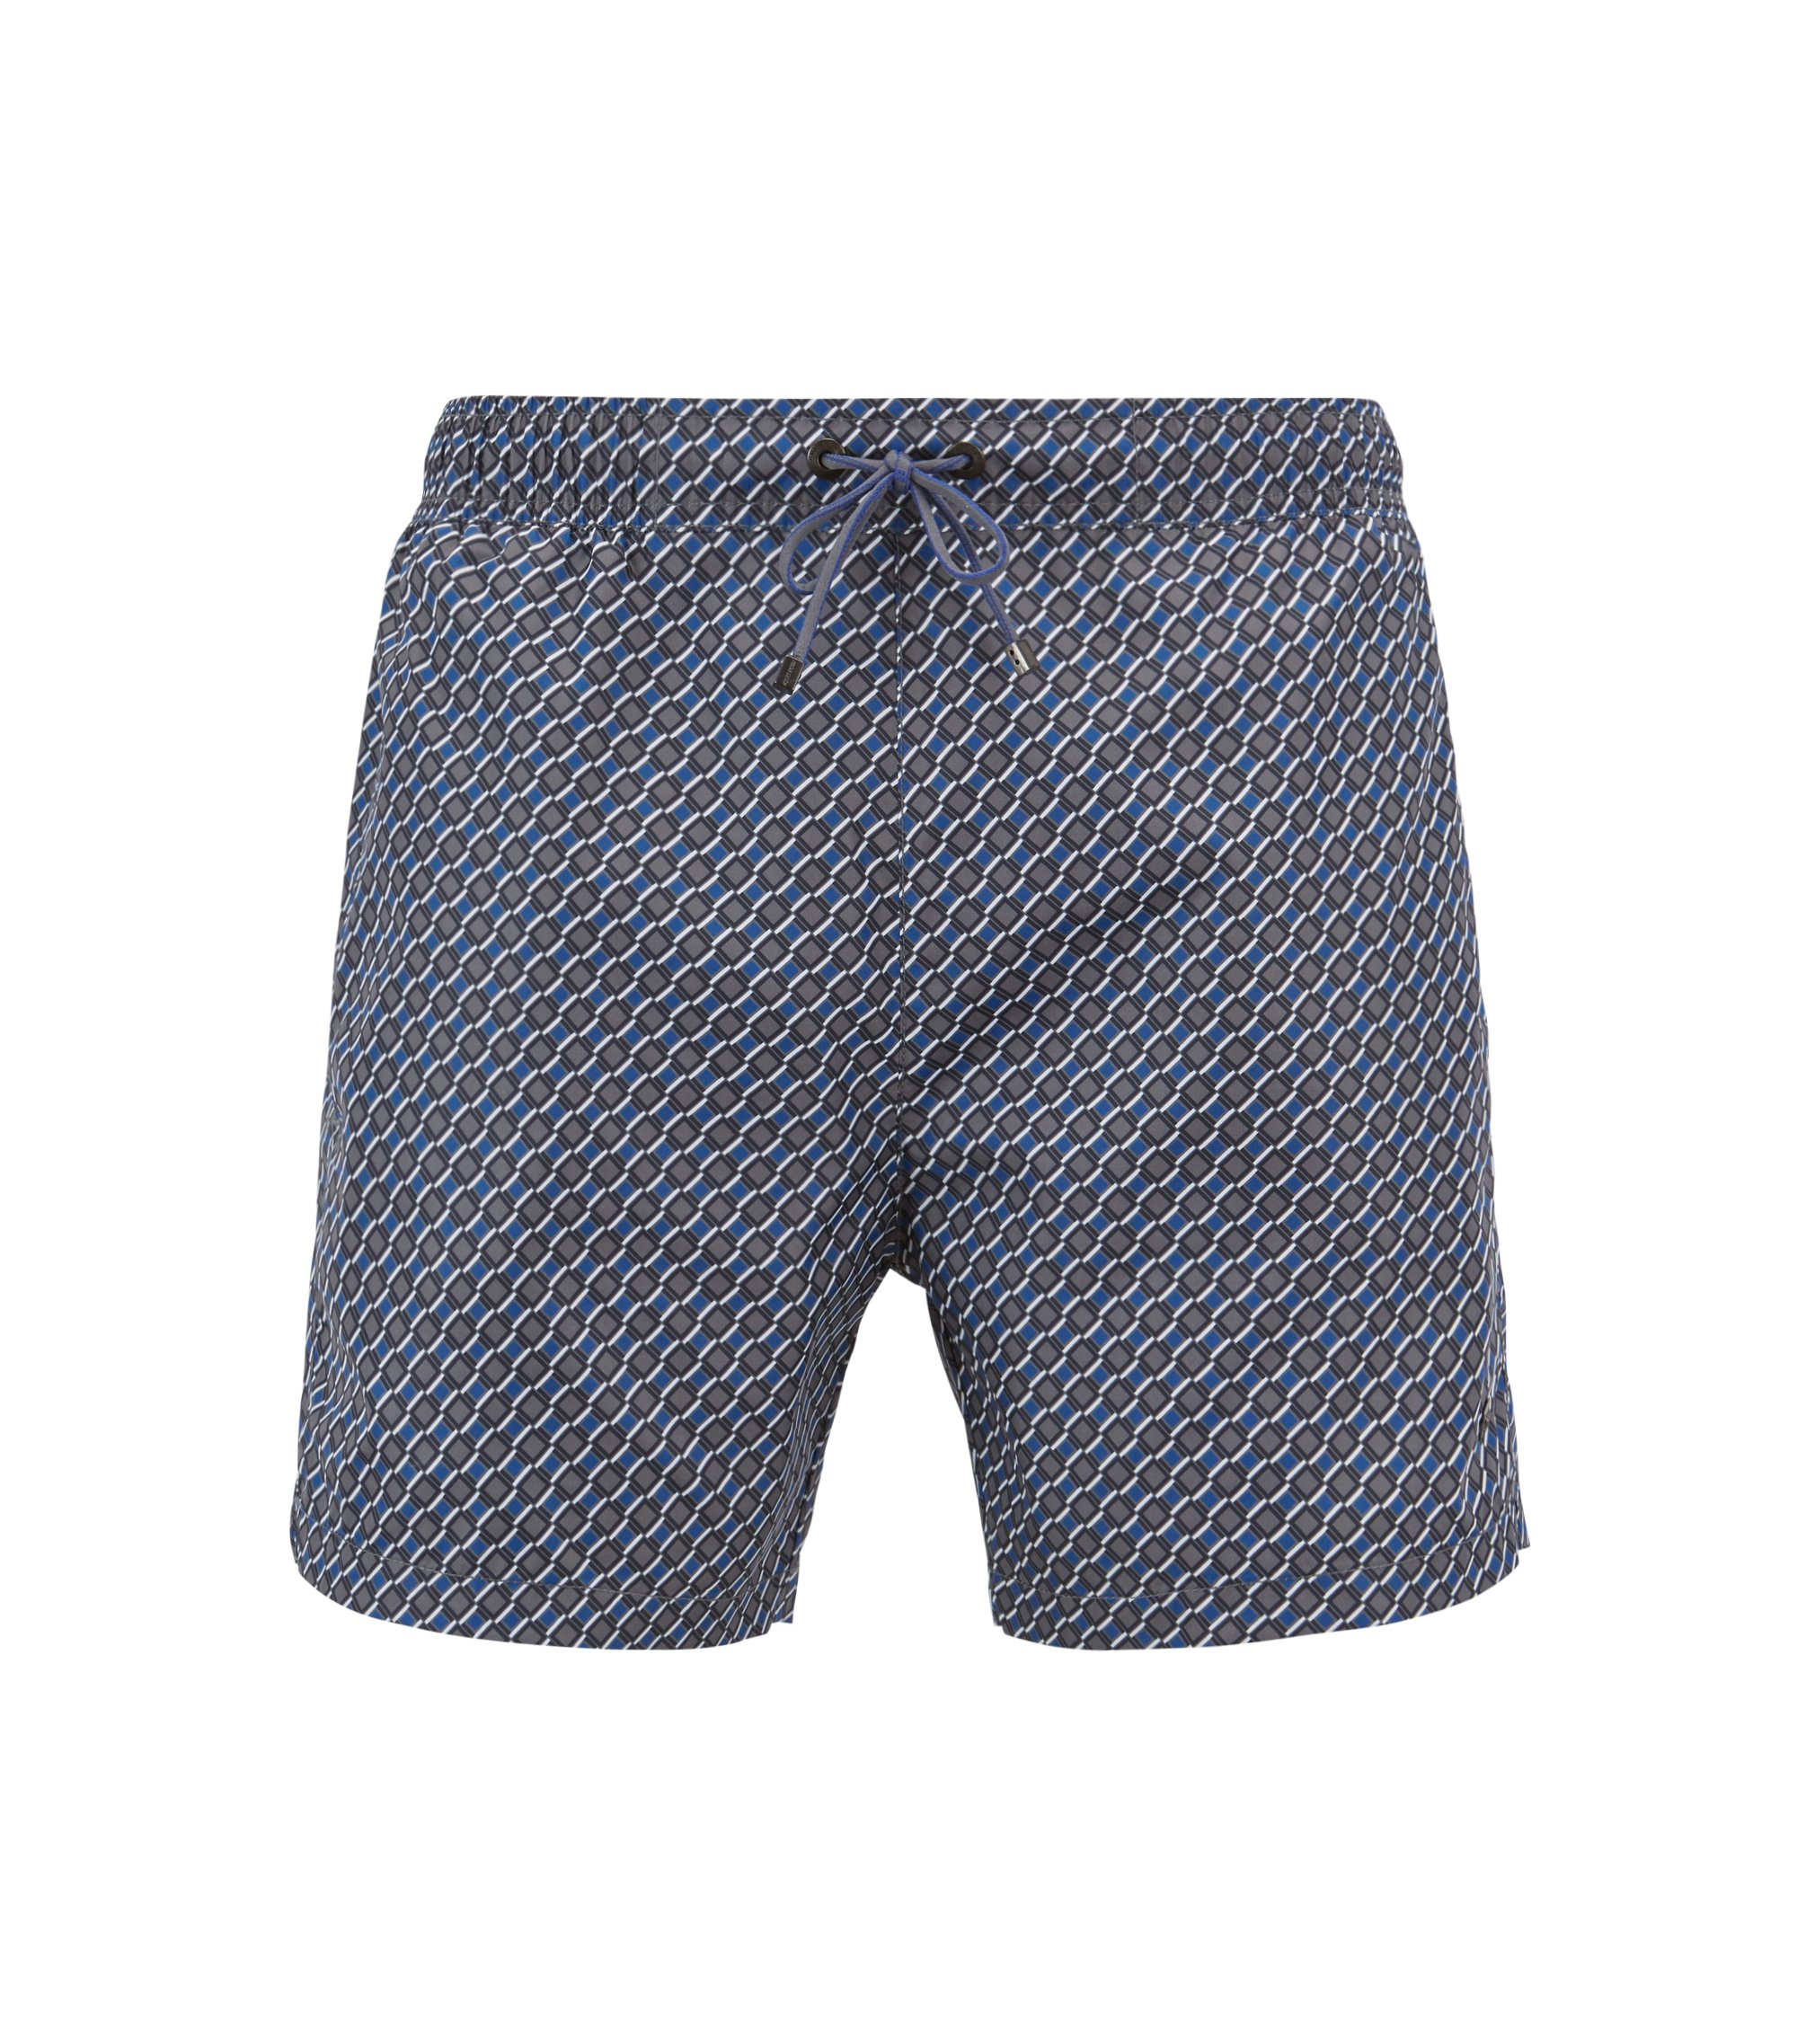 Bañador tipo shorts estampado ligero con cintura elástica, Celeste